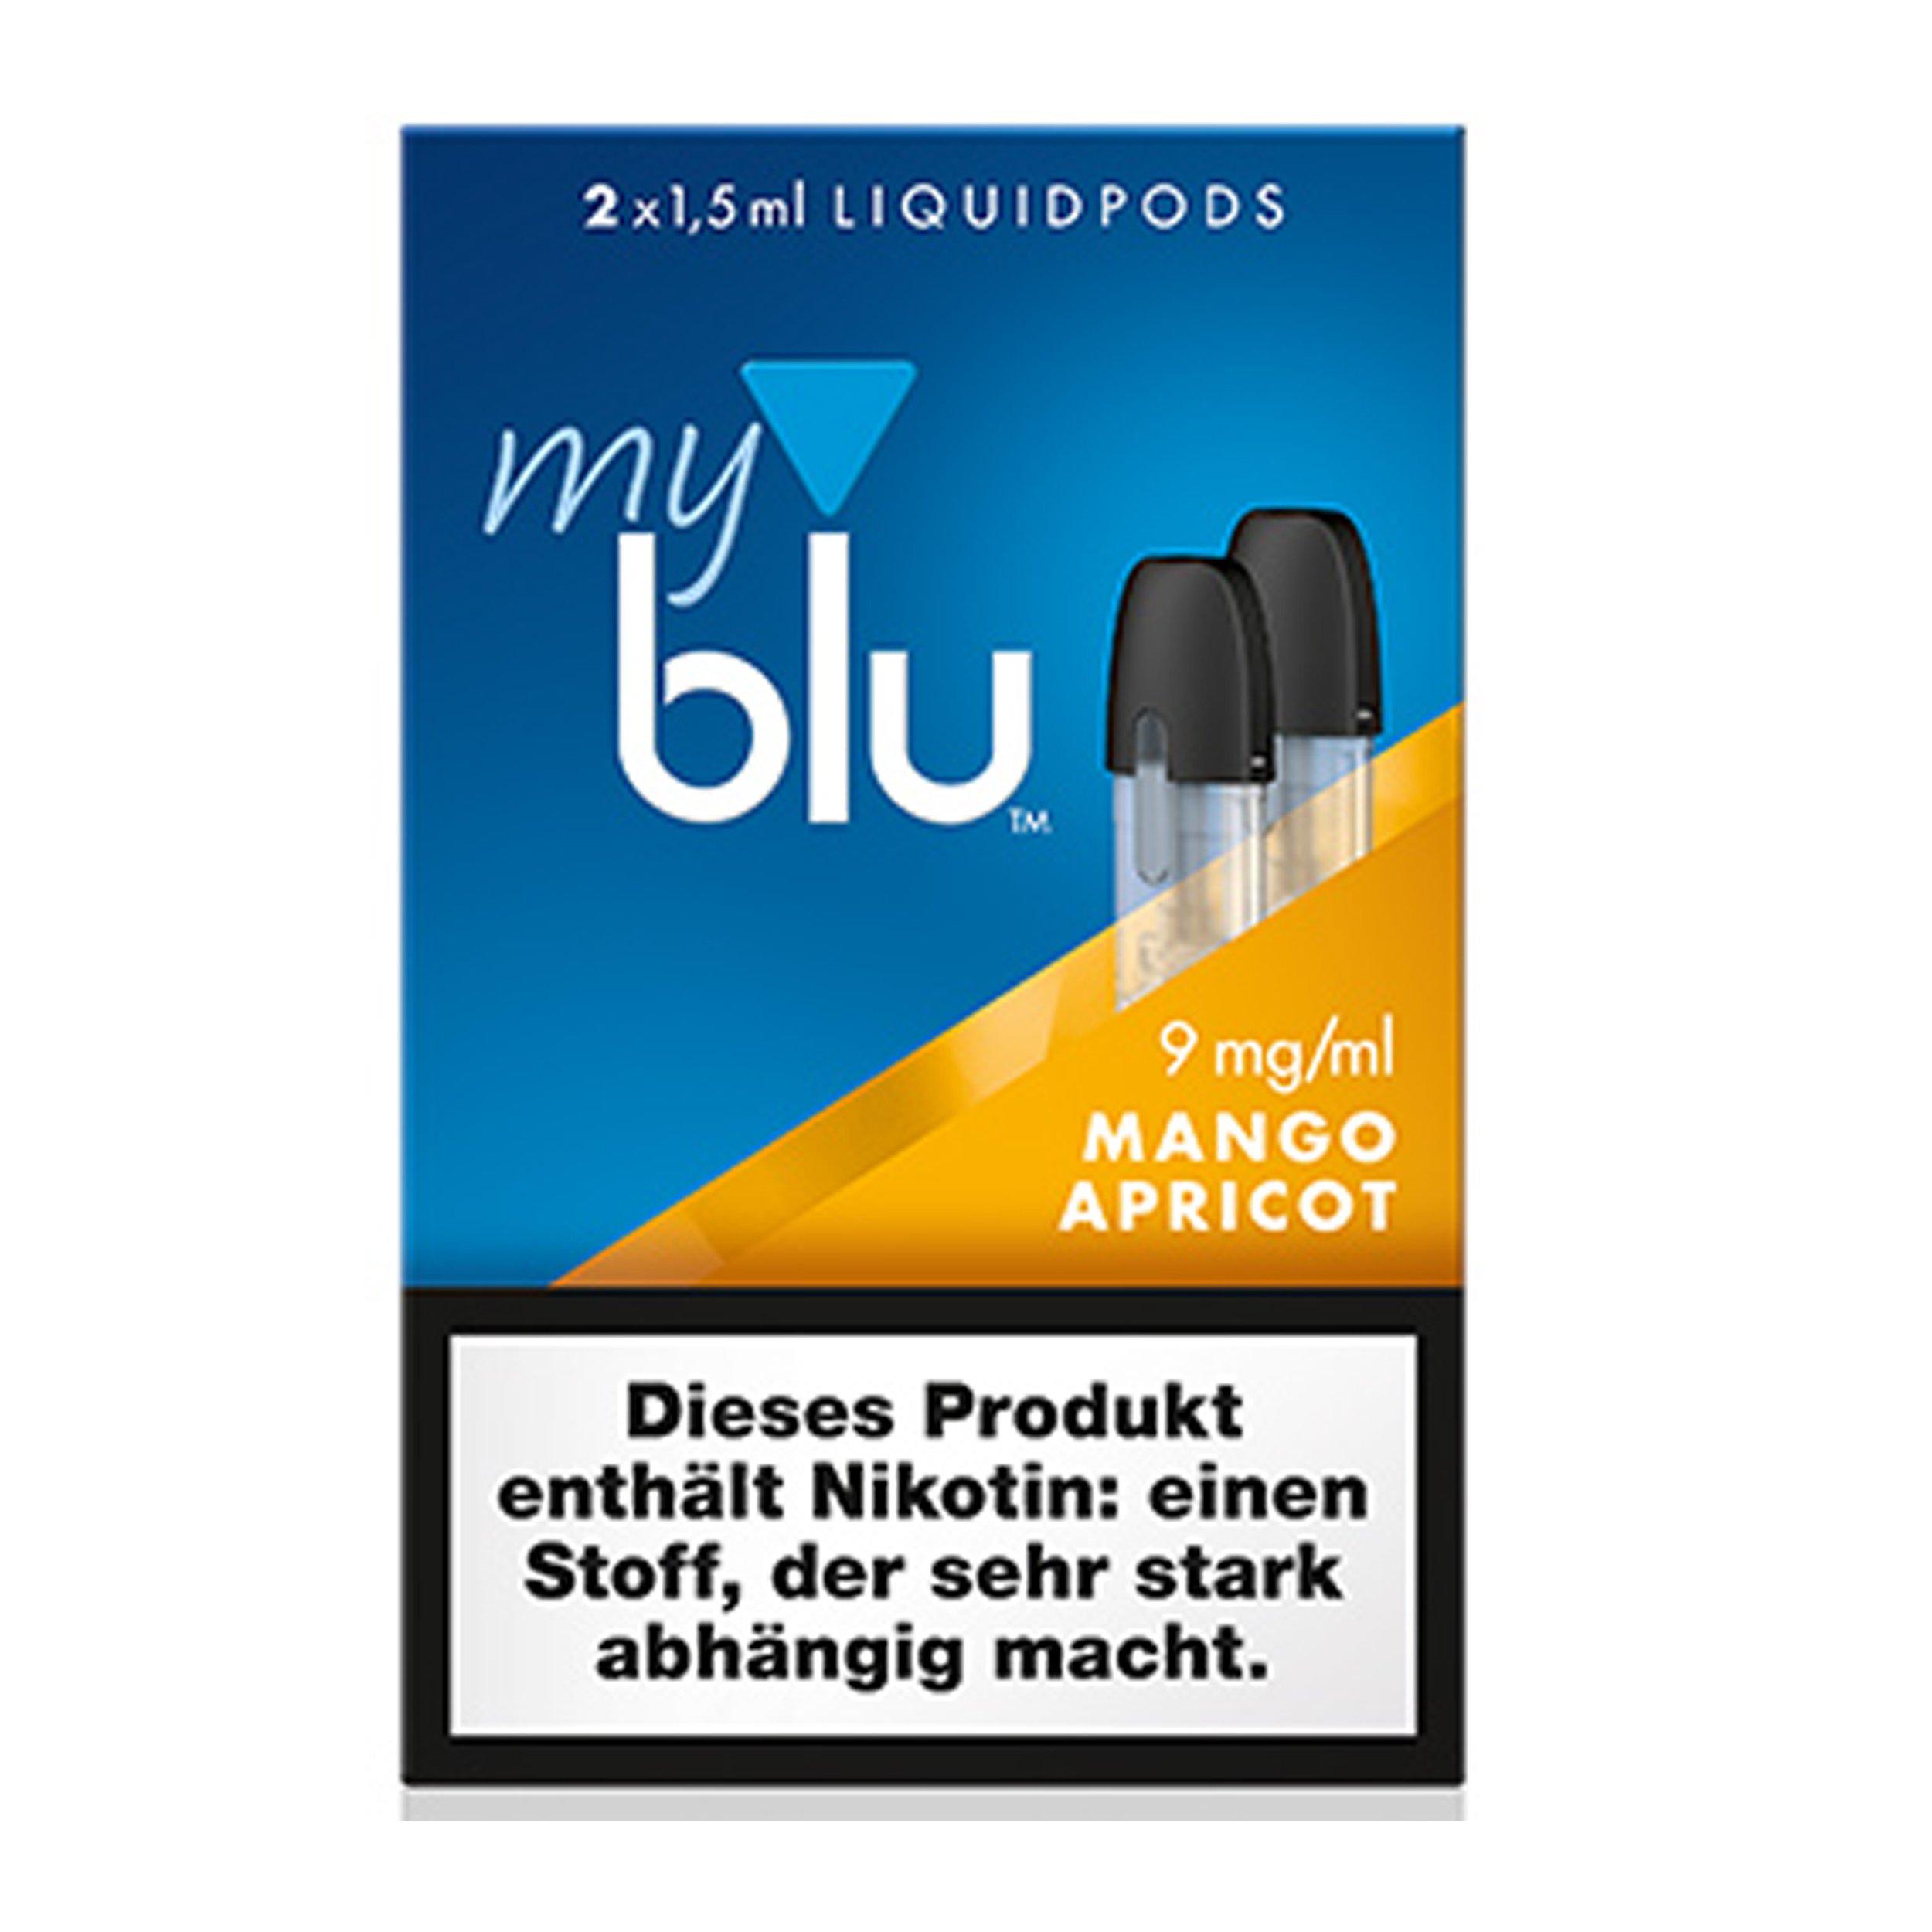 myblu Liquid Pods Mango - Apricot 9 mg/ml Nikotin